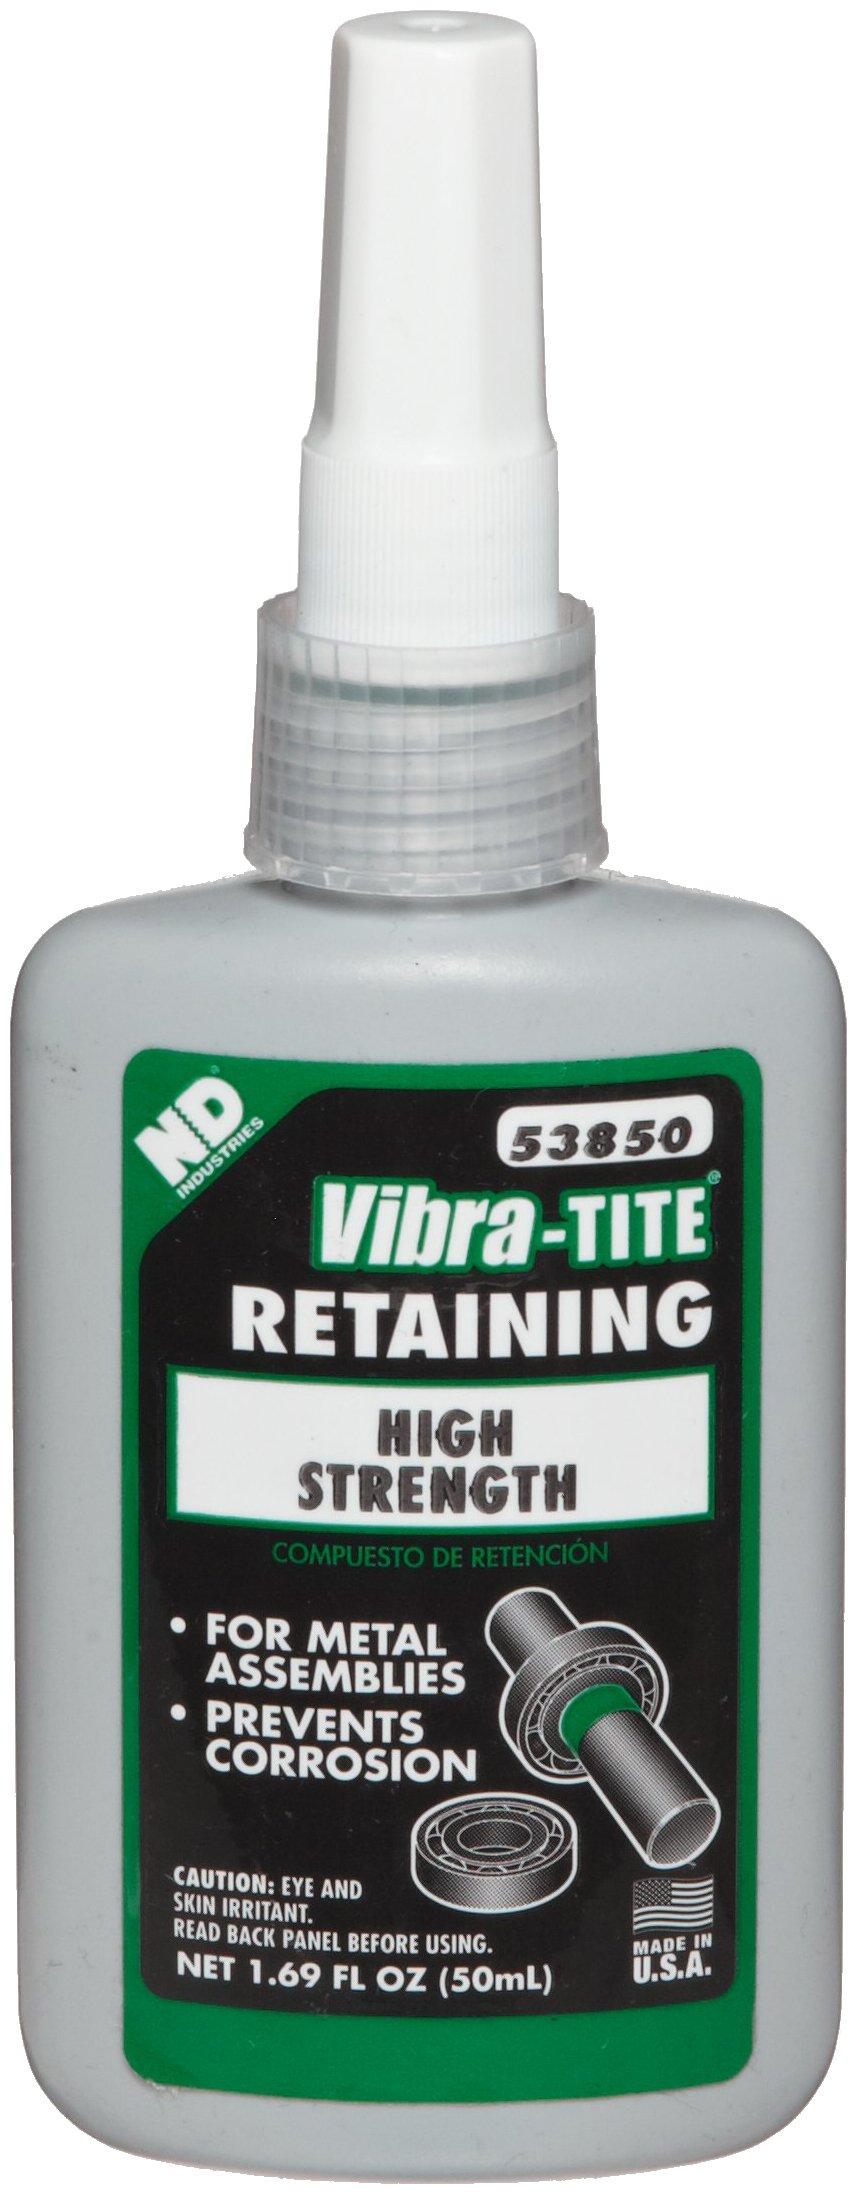 Vibra-TITE 538 High Strength Anaerobic Retaining Compound, 50 ml Bottle, Green